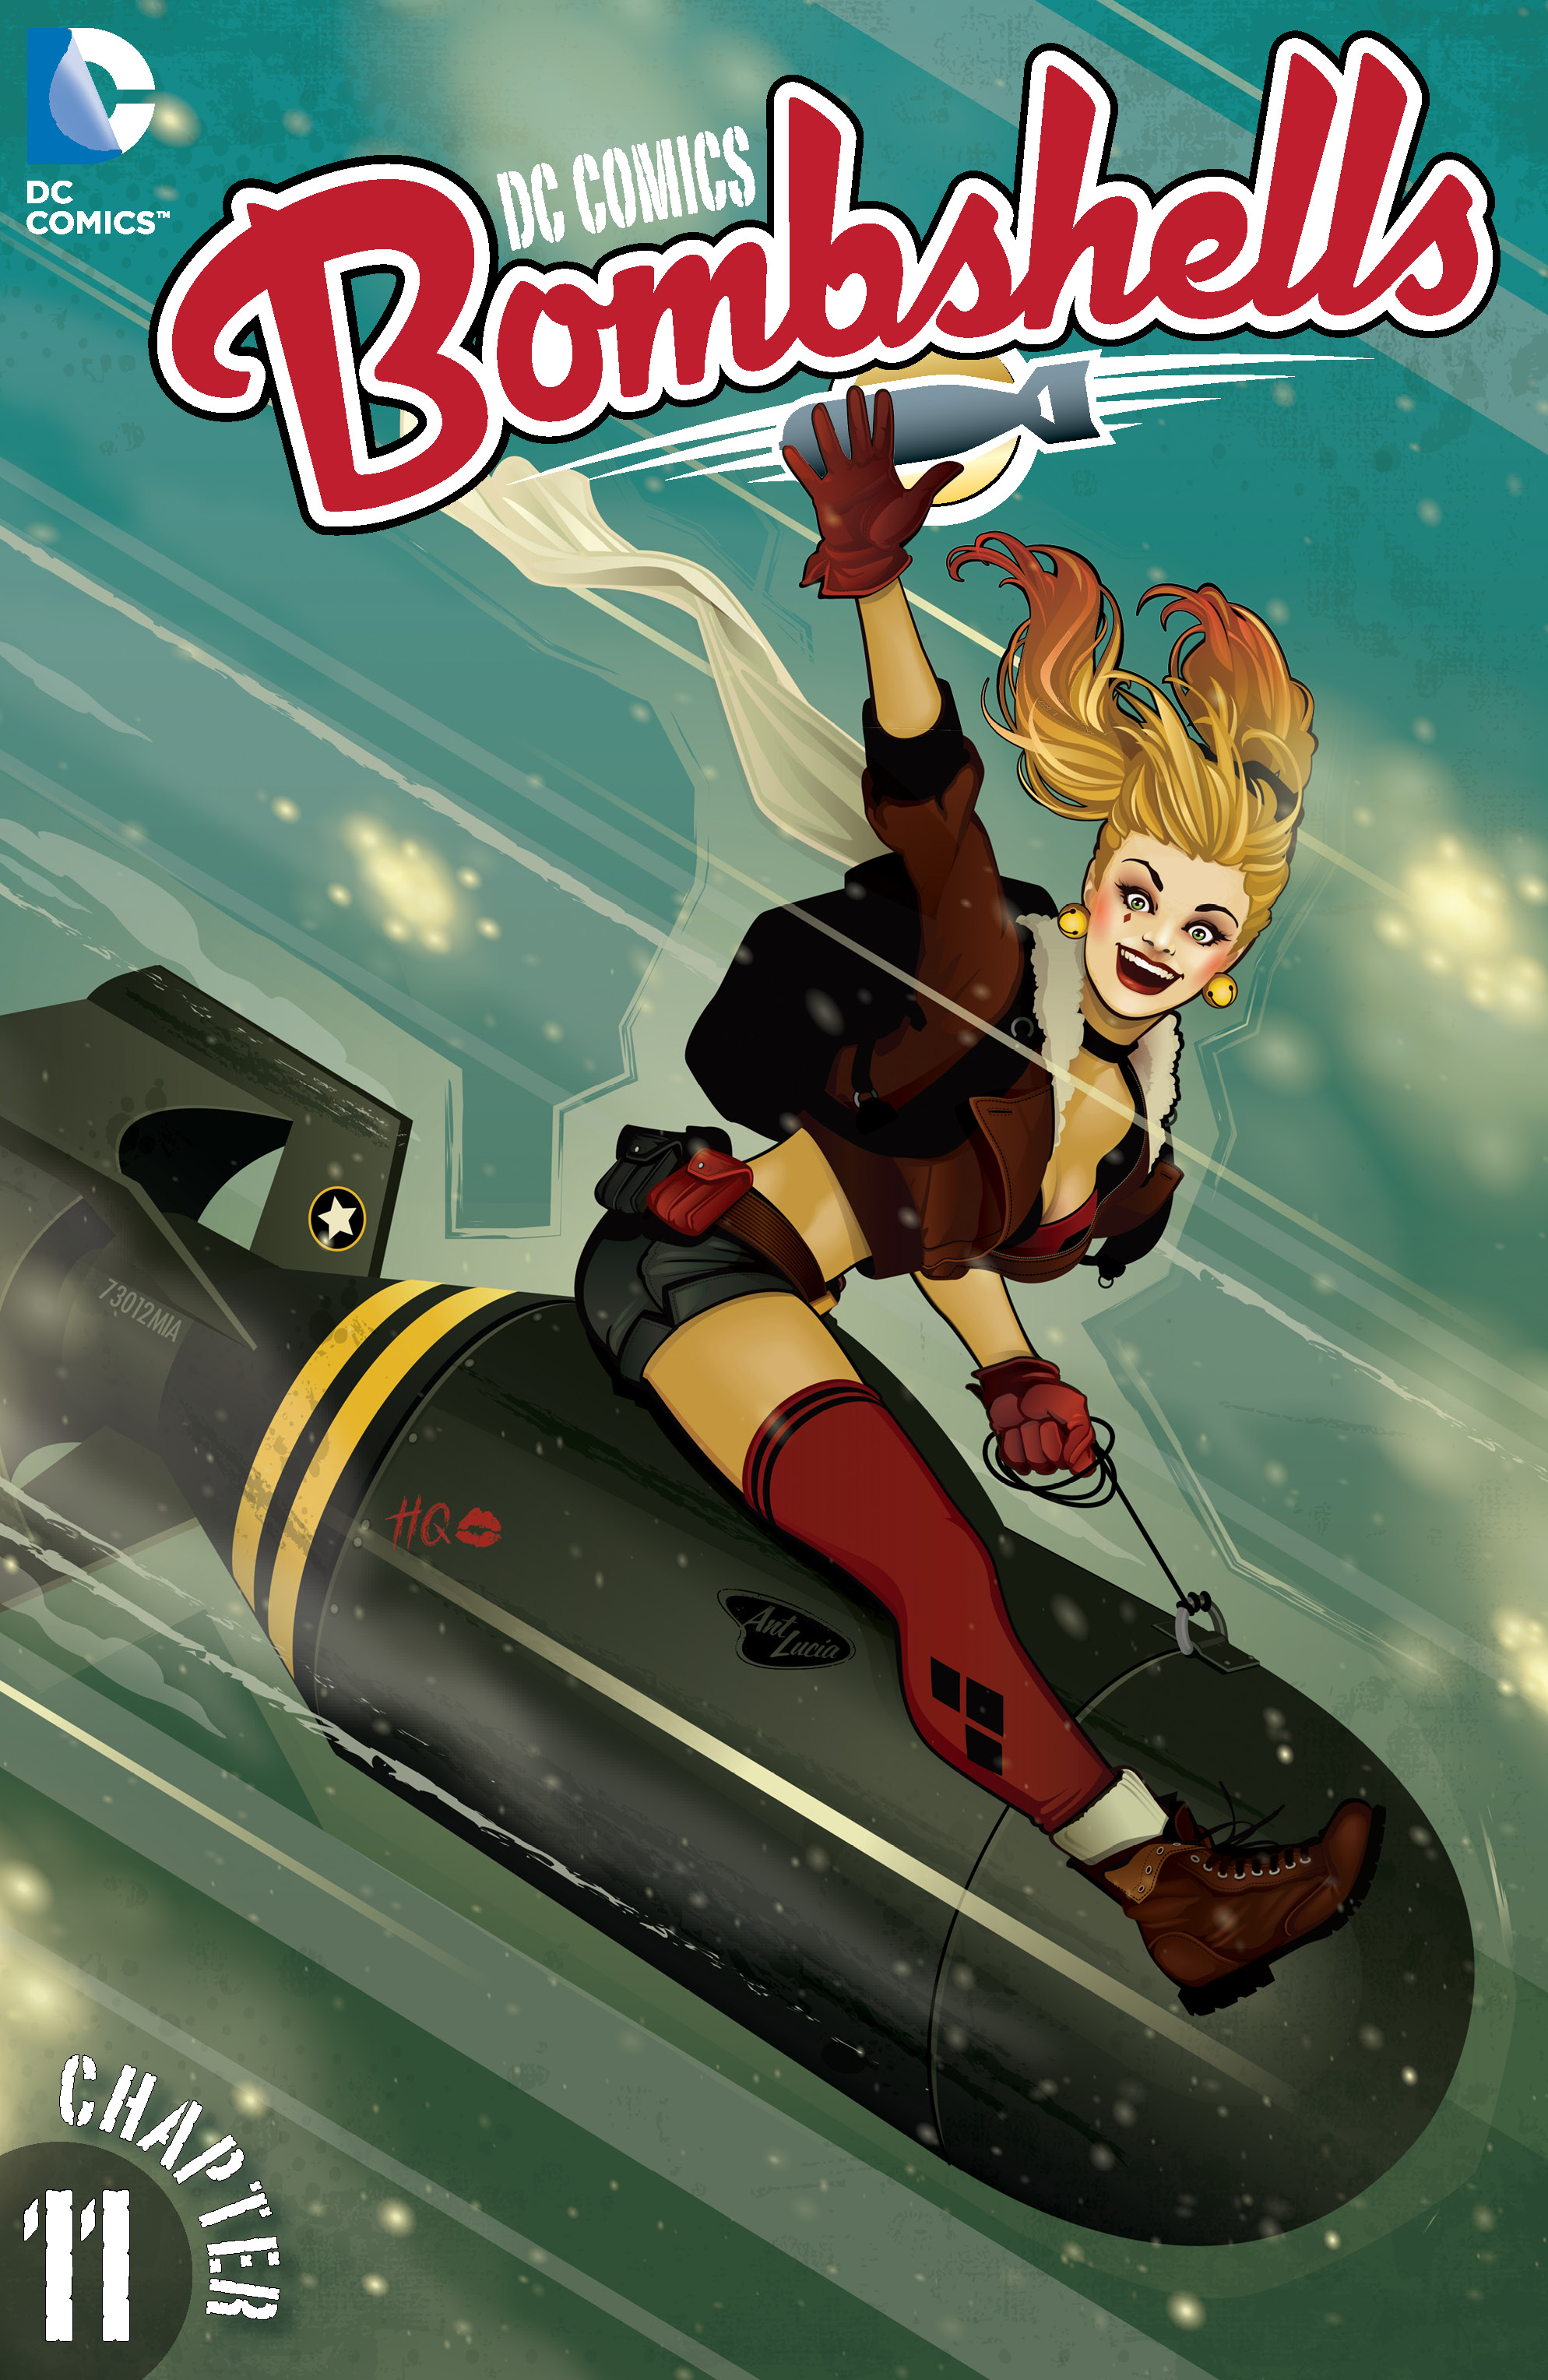 DC COMICS BOMBSHELLS #11 cover